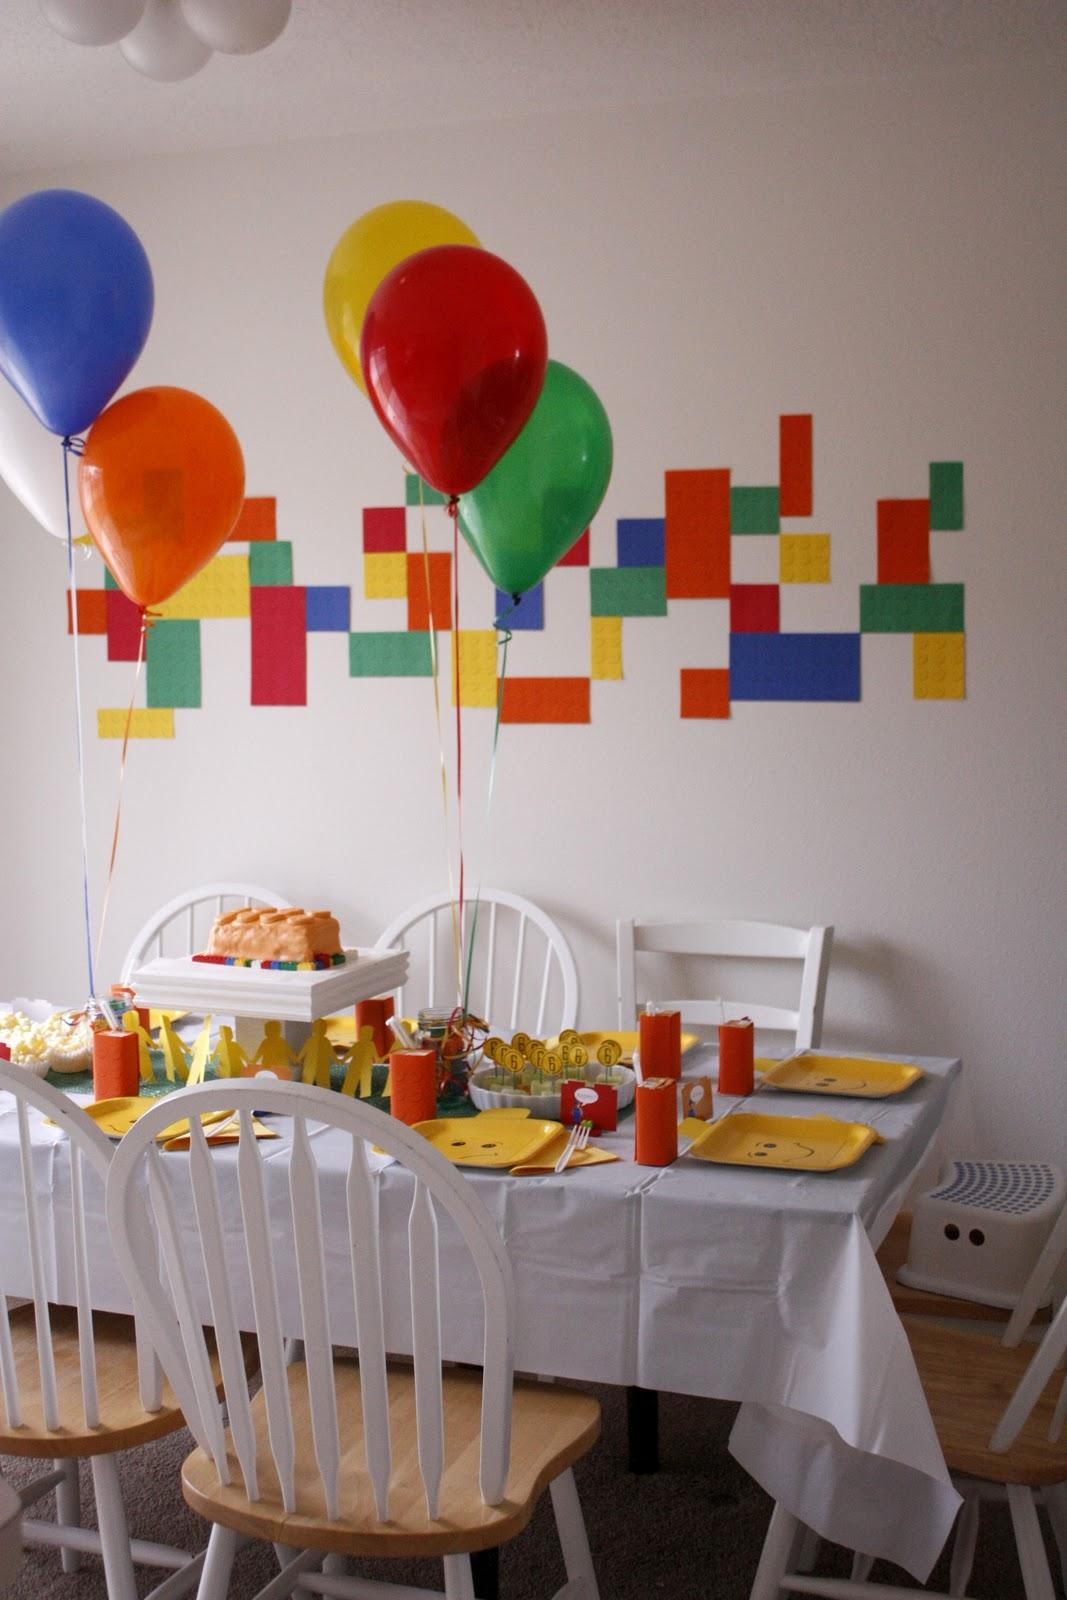 Lego birthday party january29282829g solutioingenieria Choice Image